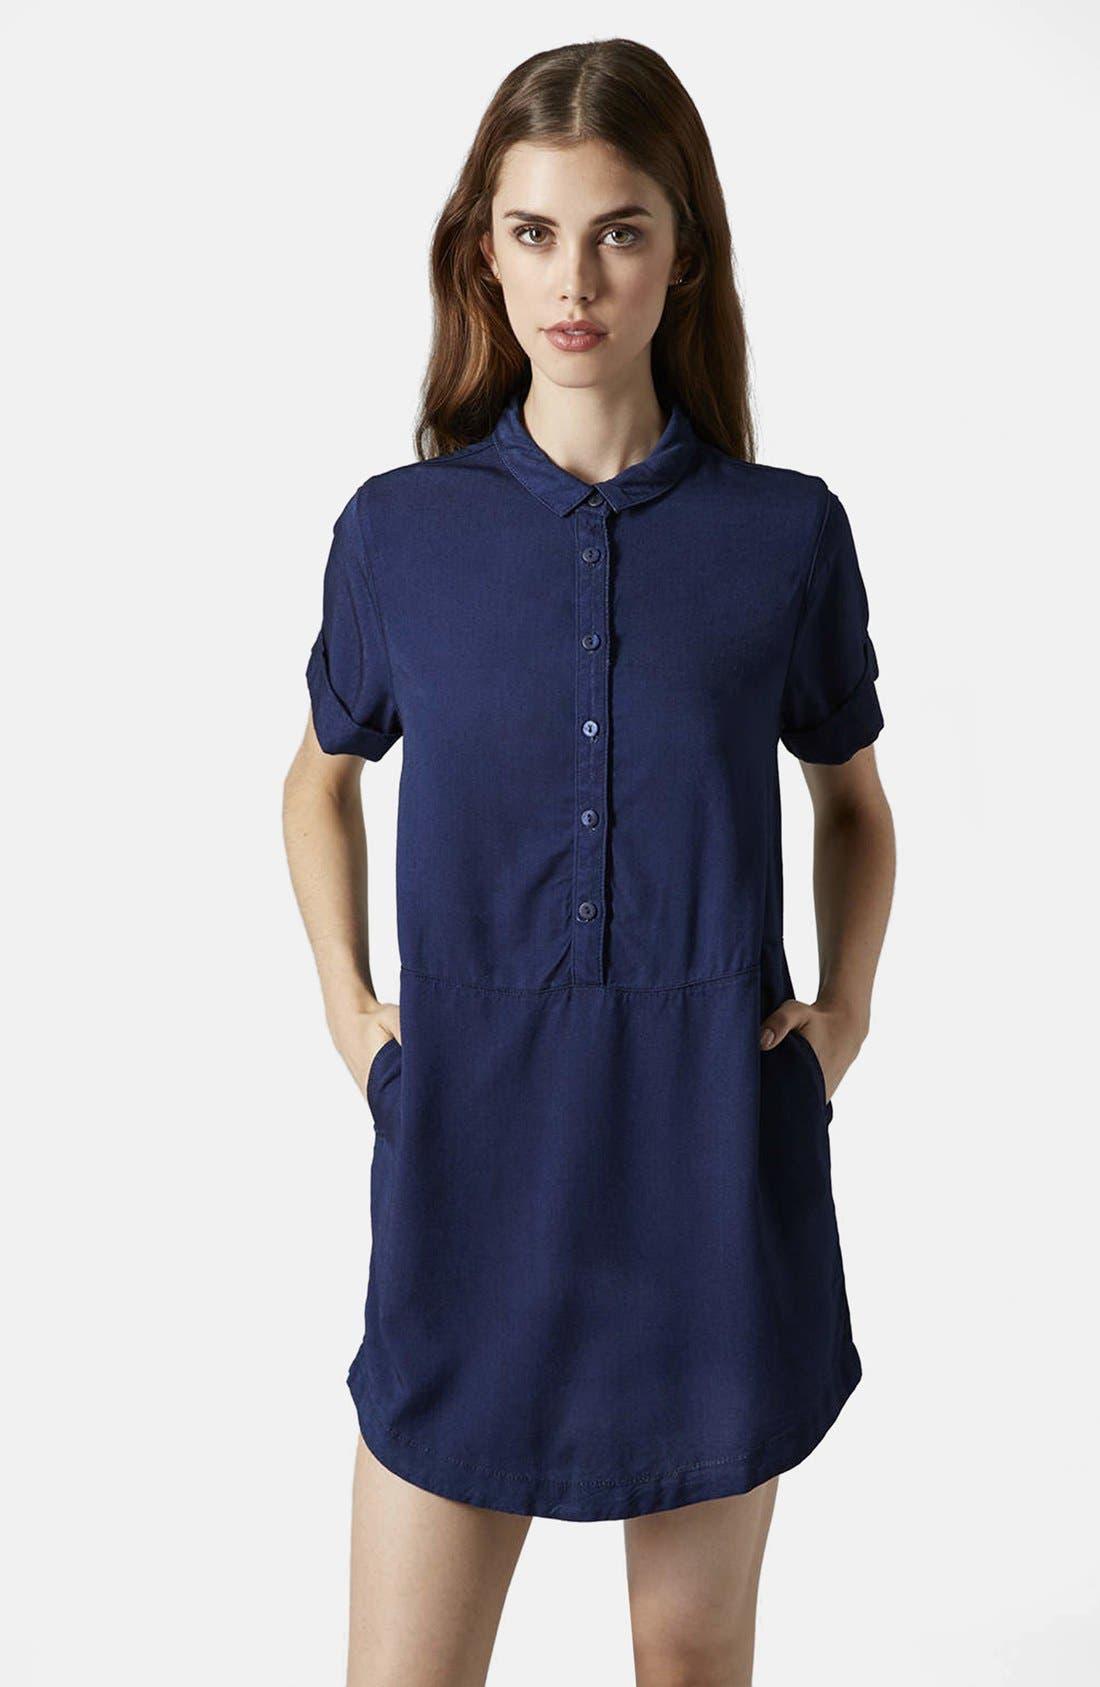 Alternate Image 1 Selected - Topshop Denim Shirtdress